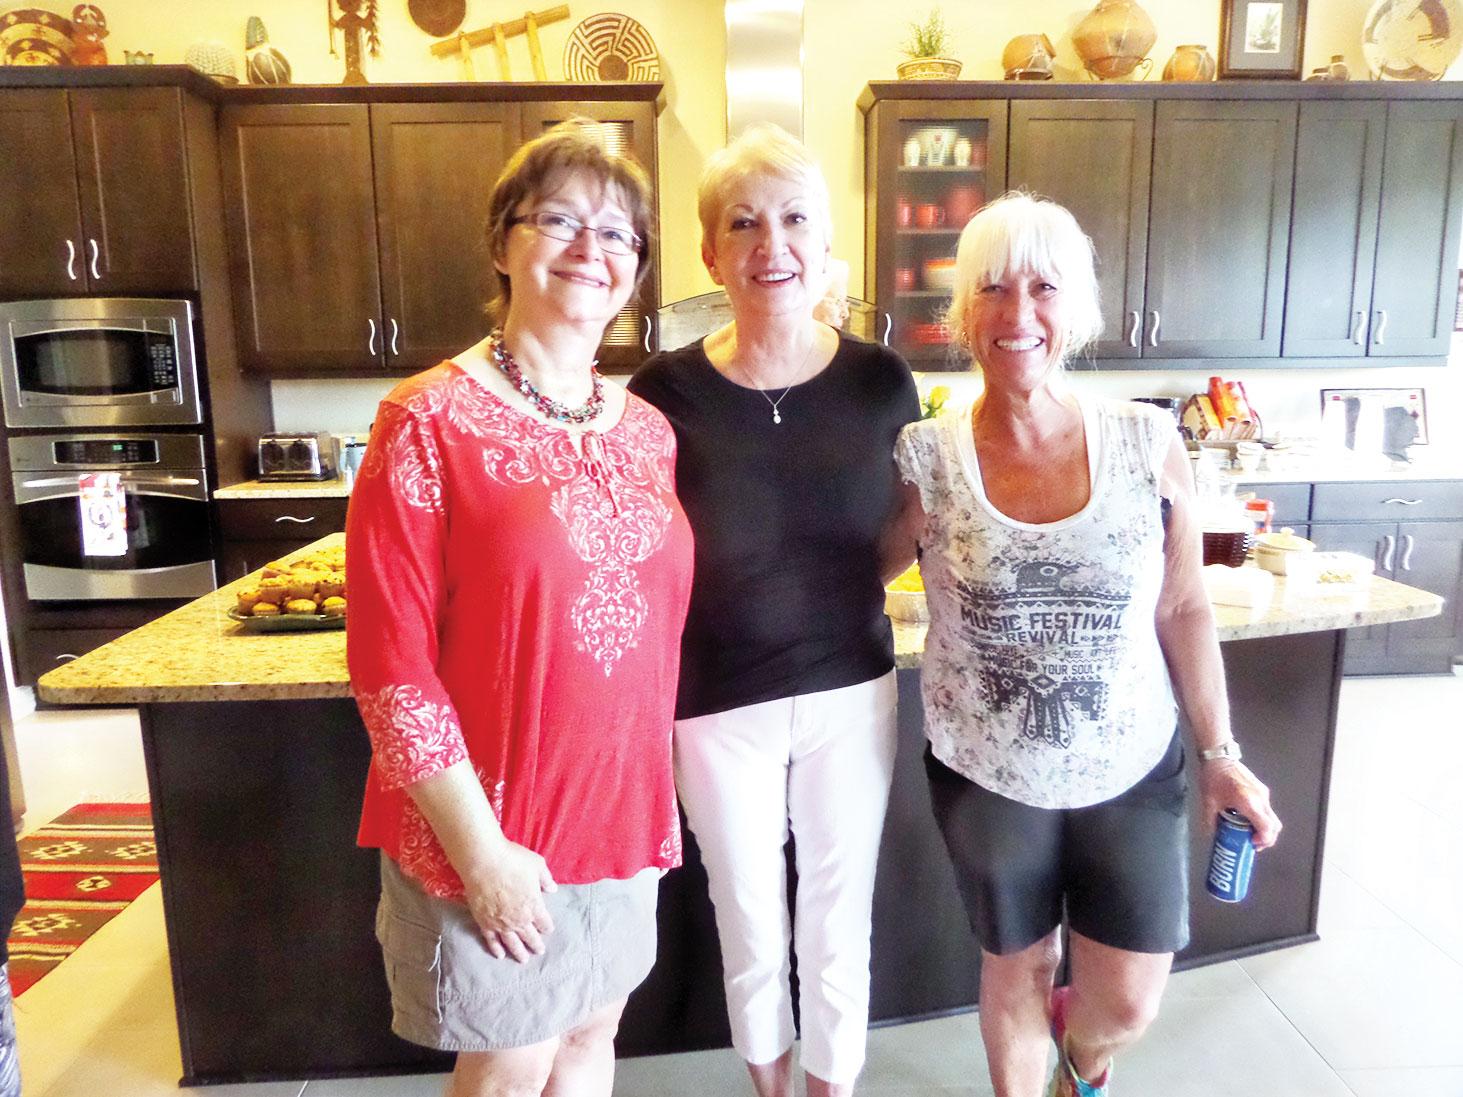 Shirley Waterhouse, Bert Duplantis and Barbara Shippy wait in line for food.